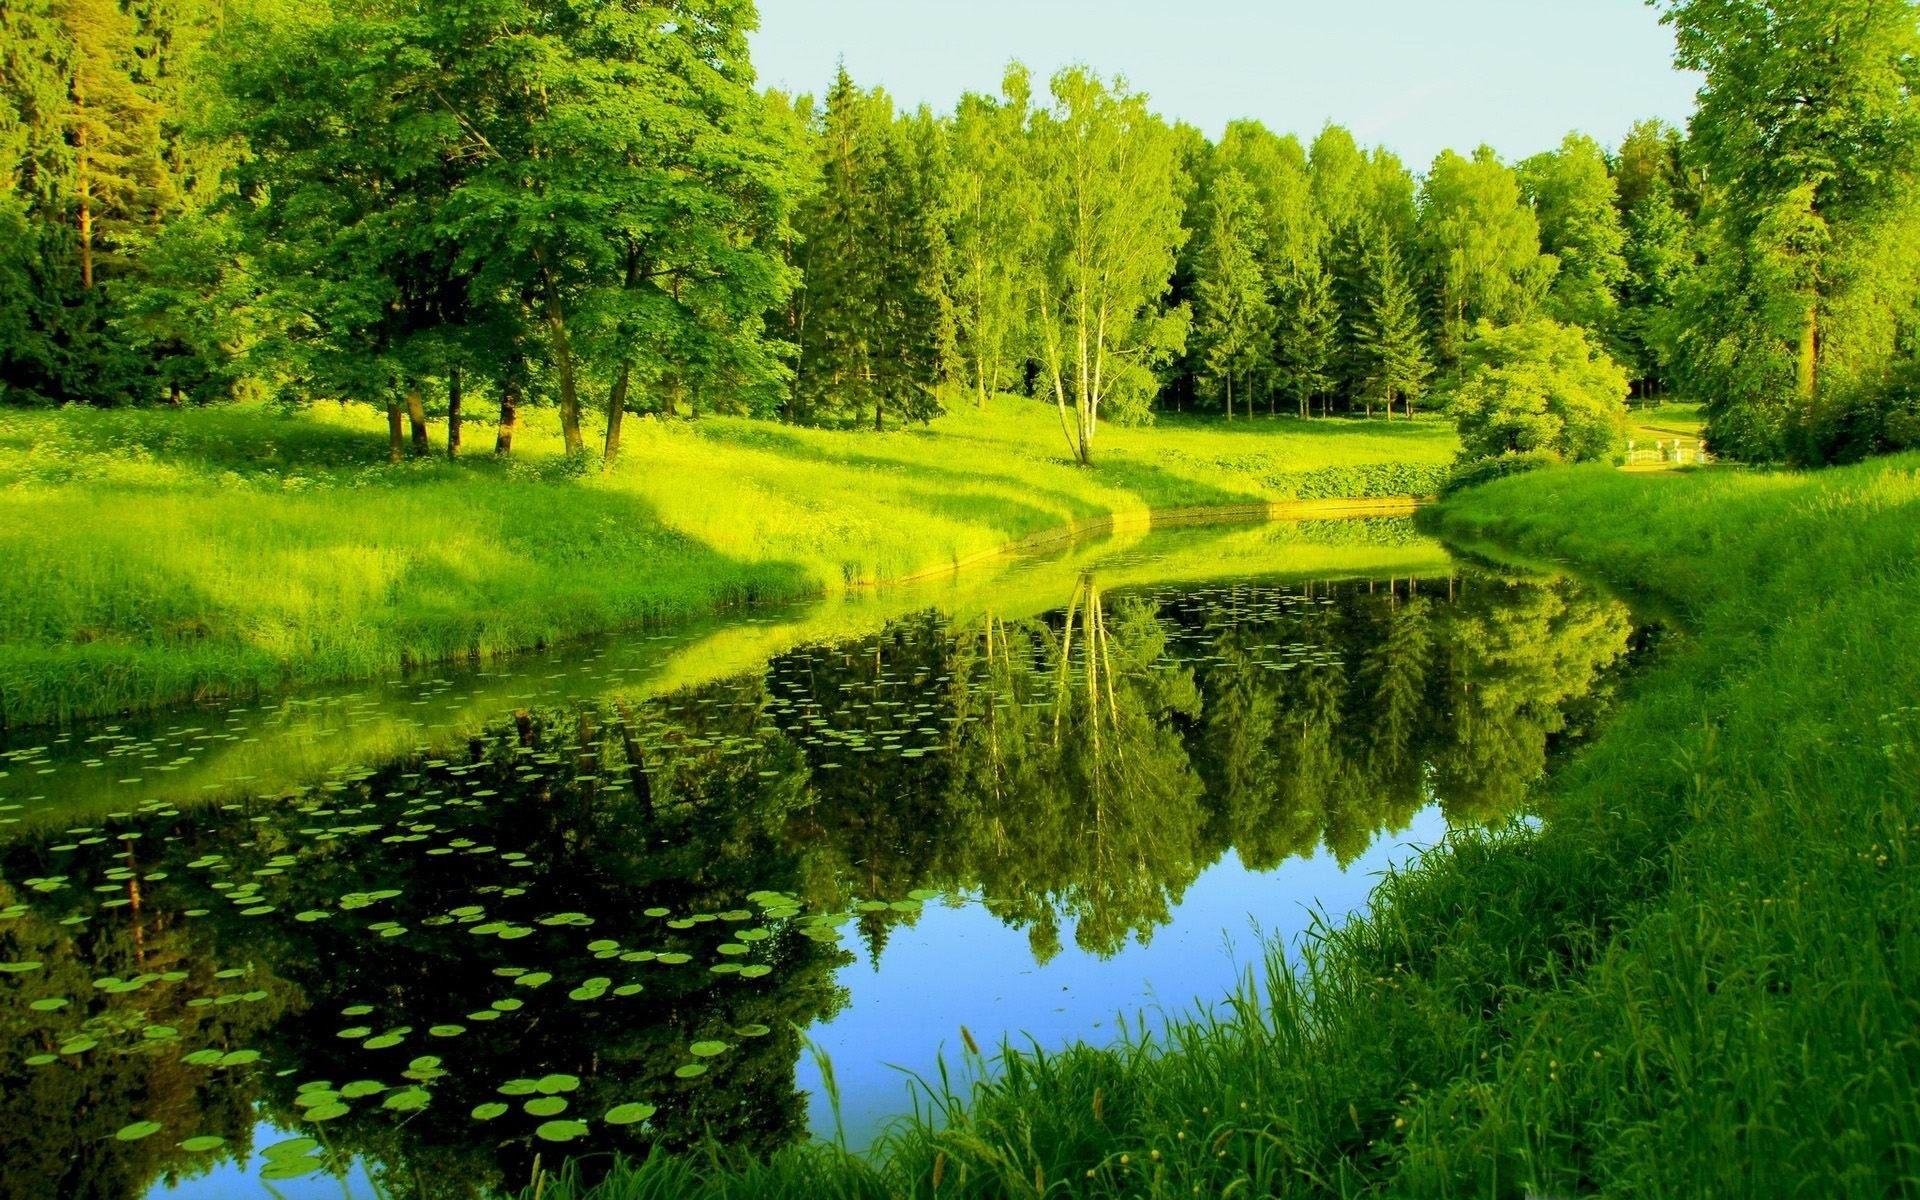 Картинки с речкой природа